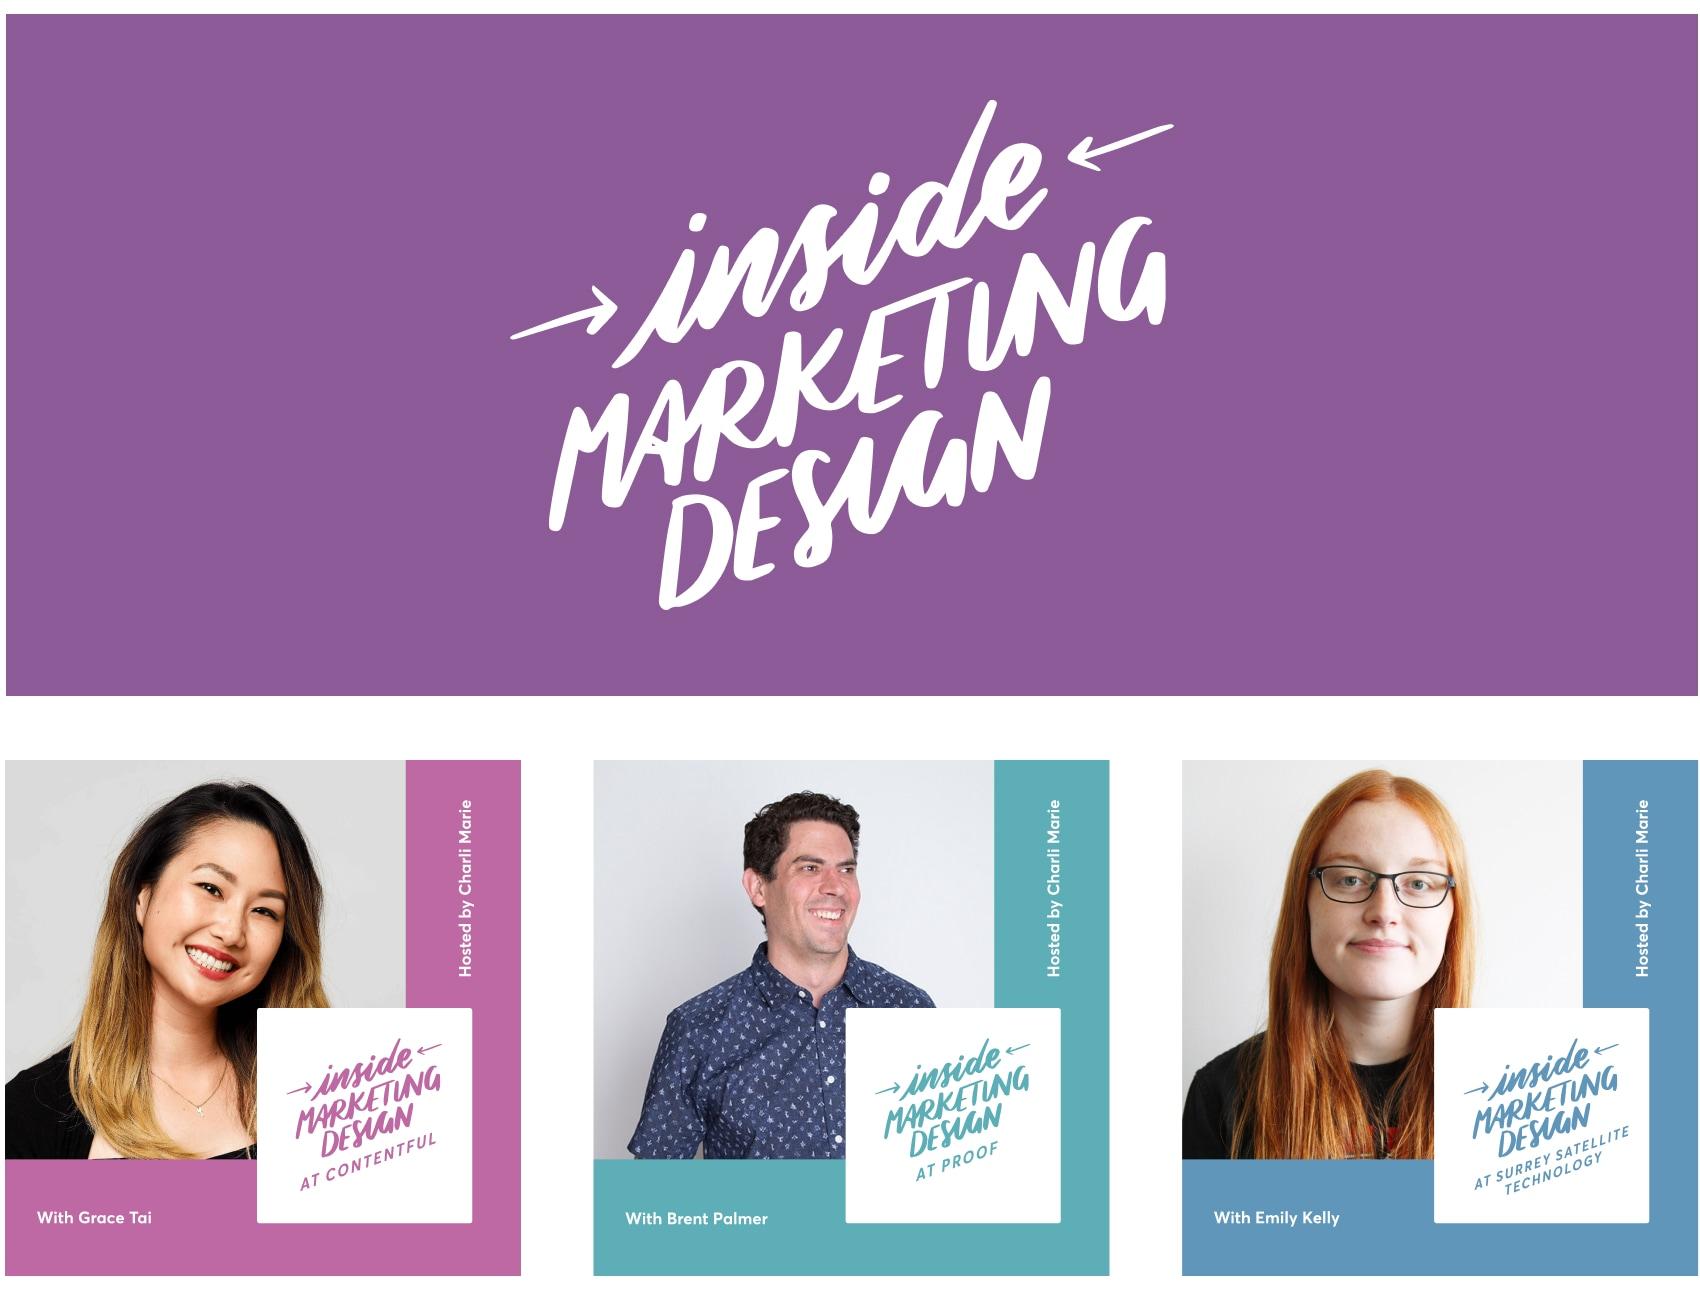 Handwritten Inside Marketing Design logo with episode cover art examples